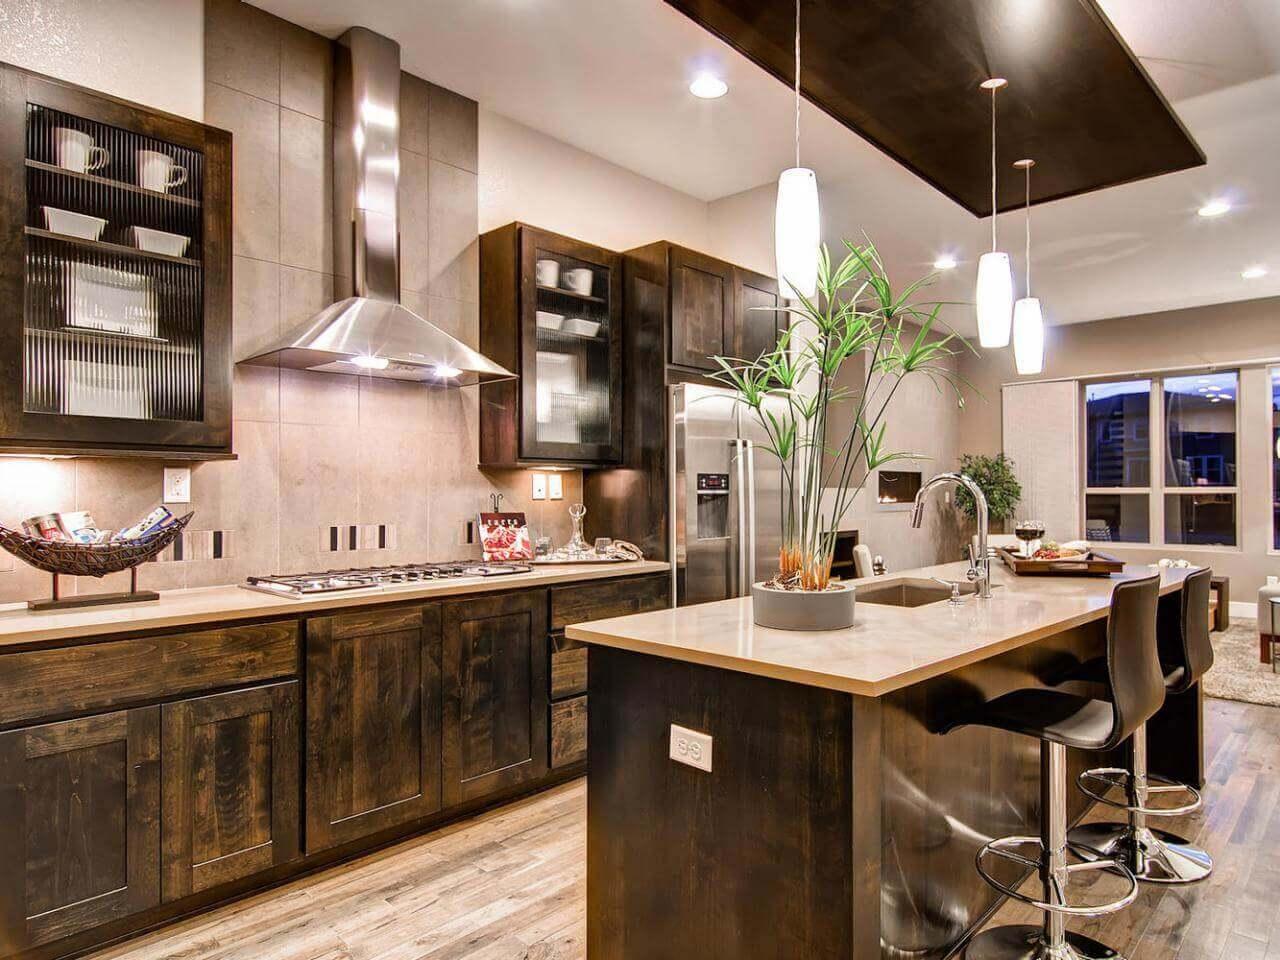 78 Great Looking Modern Kitchen Gallery Sinks Islands Appliances Lights Backsplashes